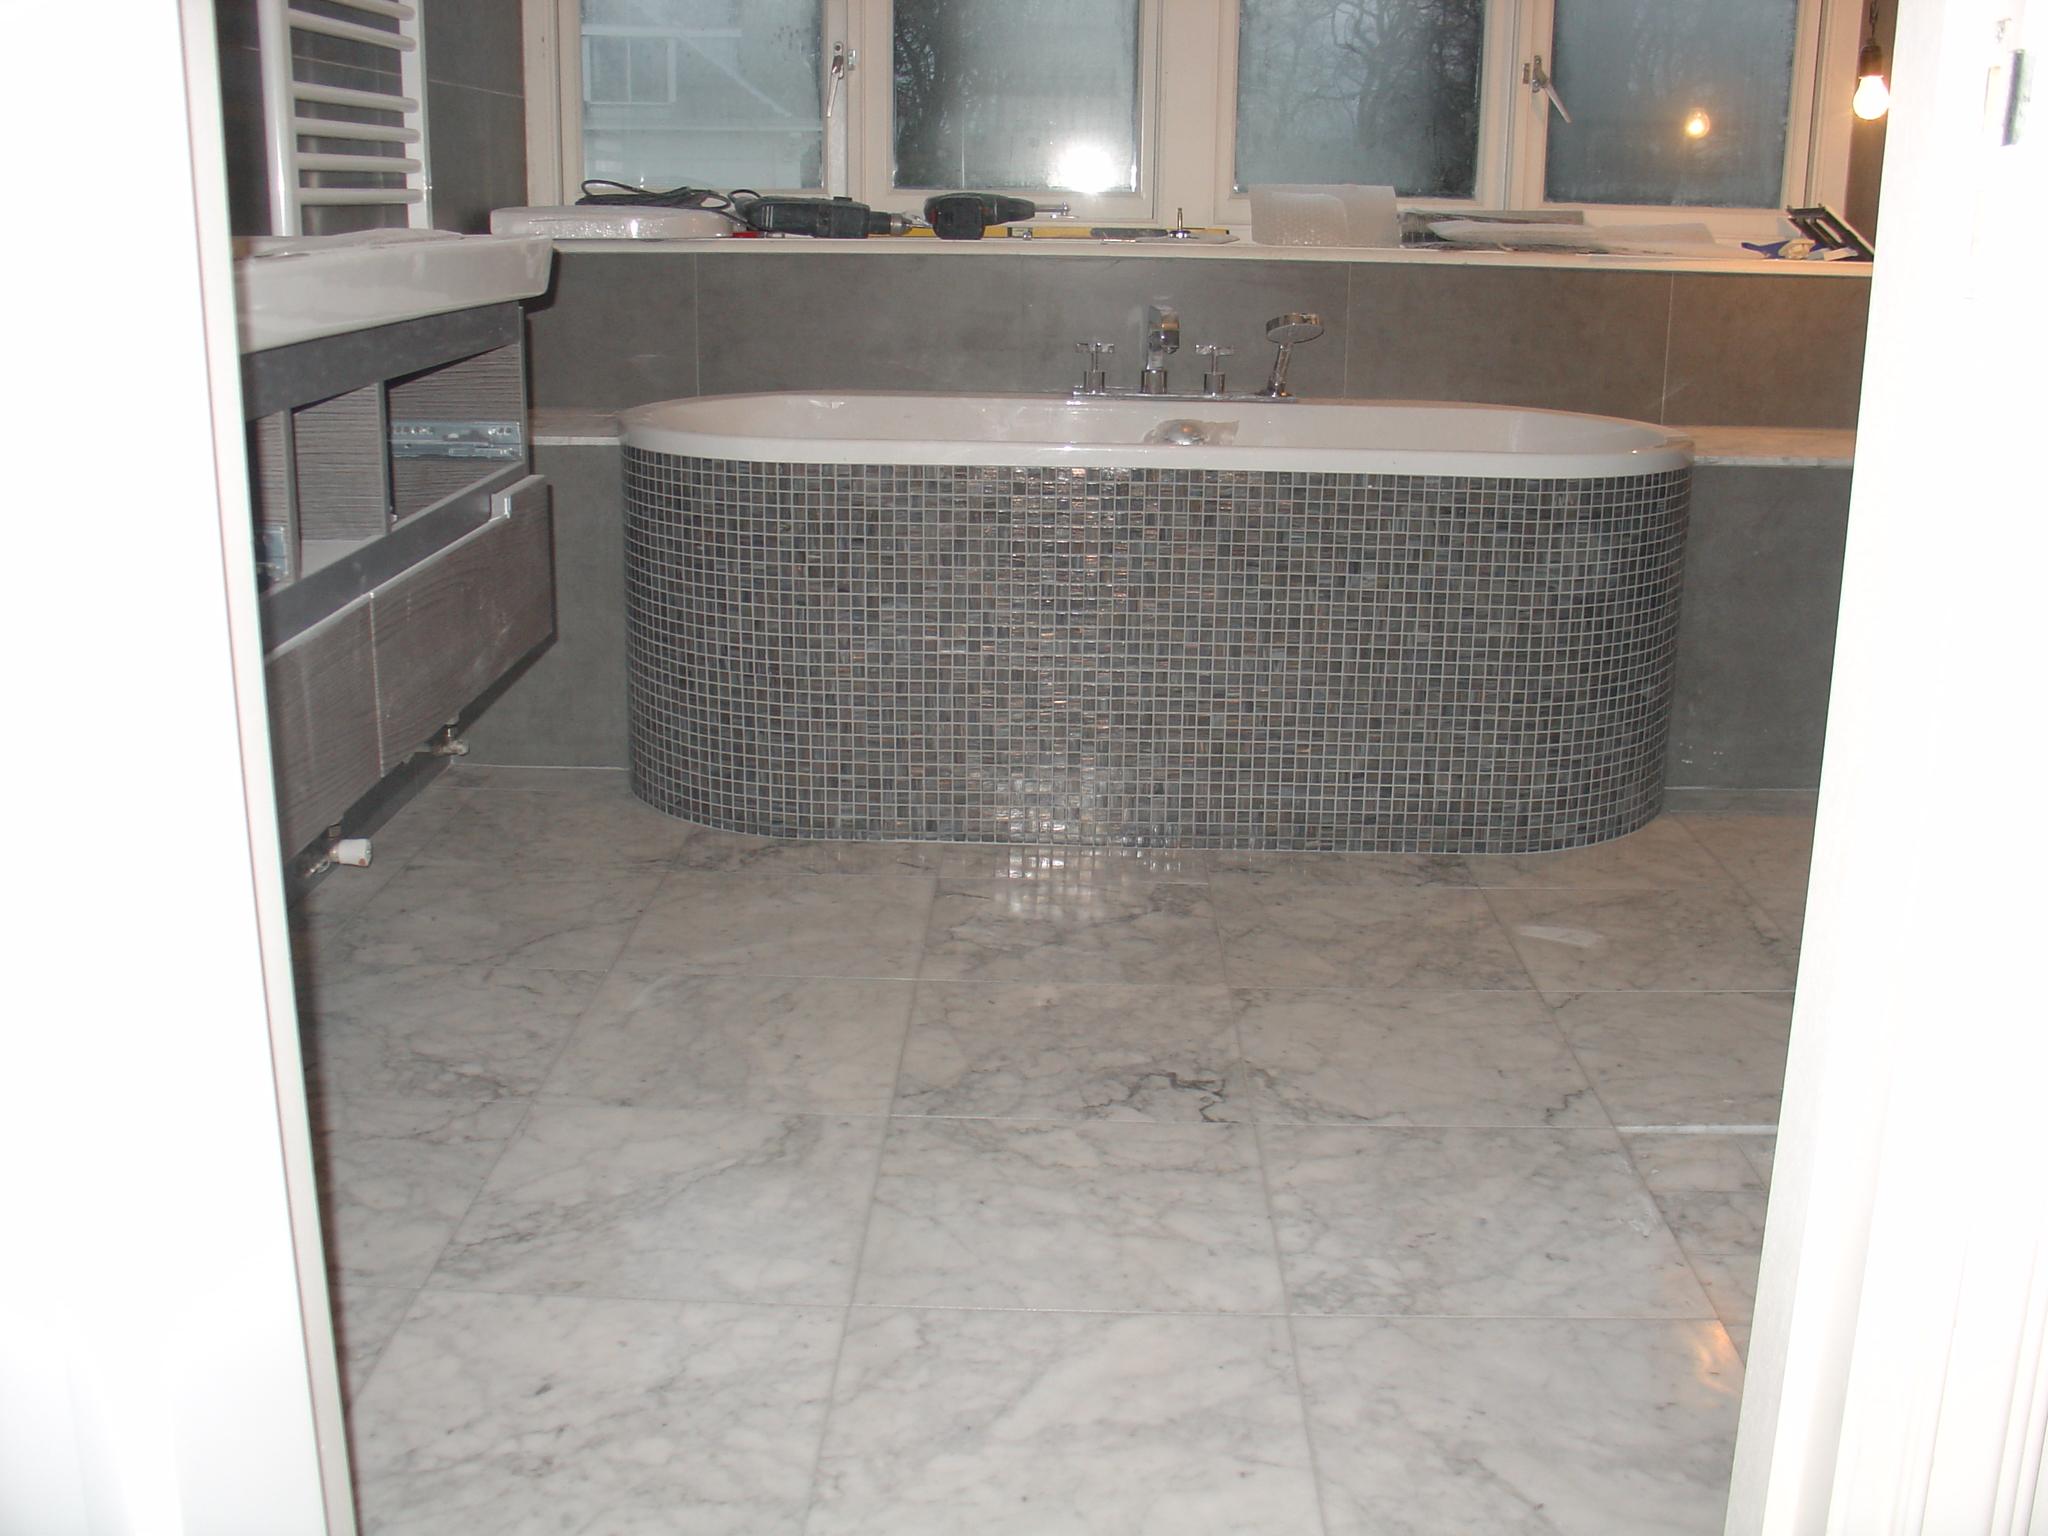 Badkamer tegels kalk - Badkamer tegels mozaiek ...